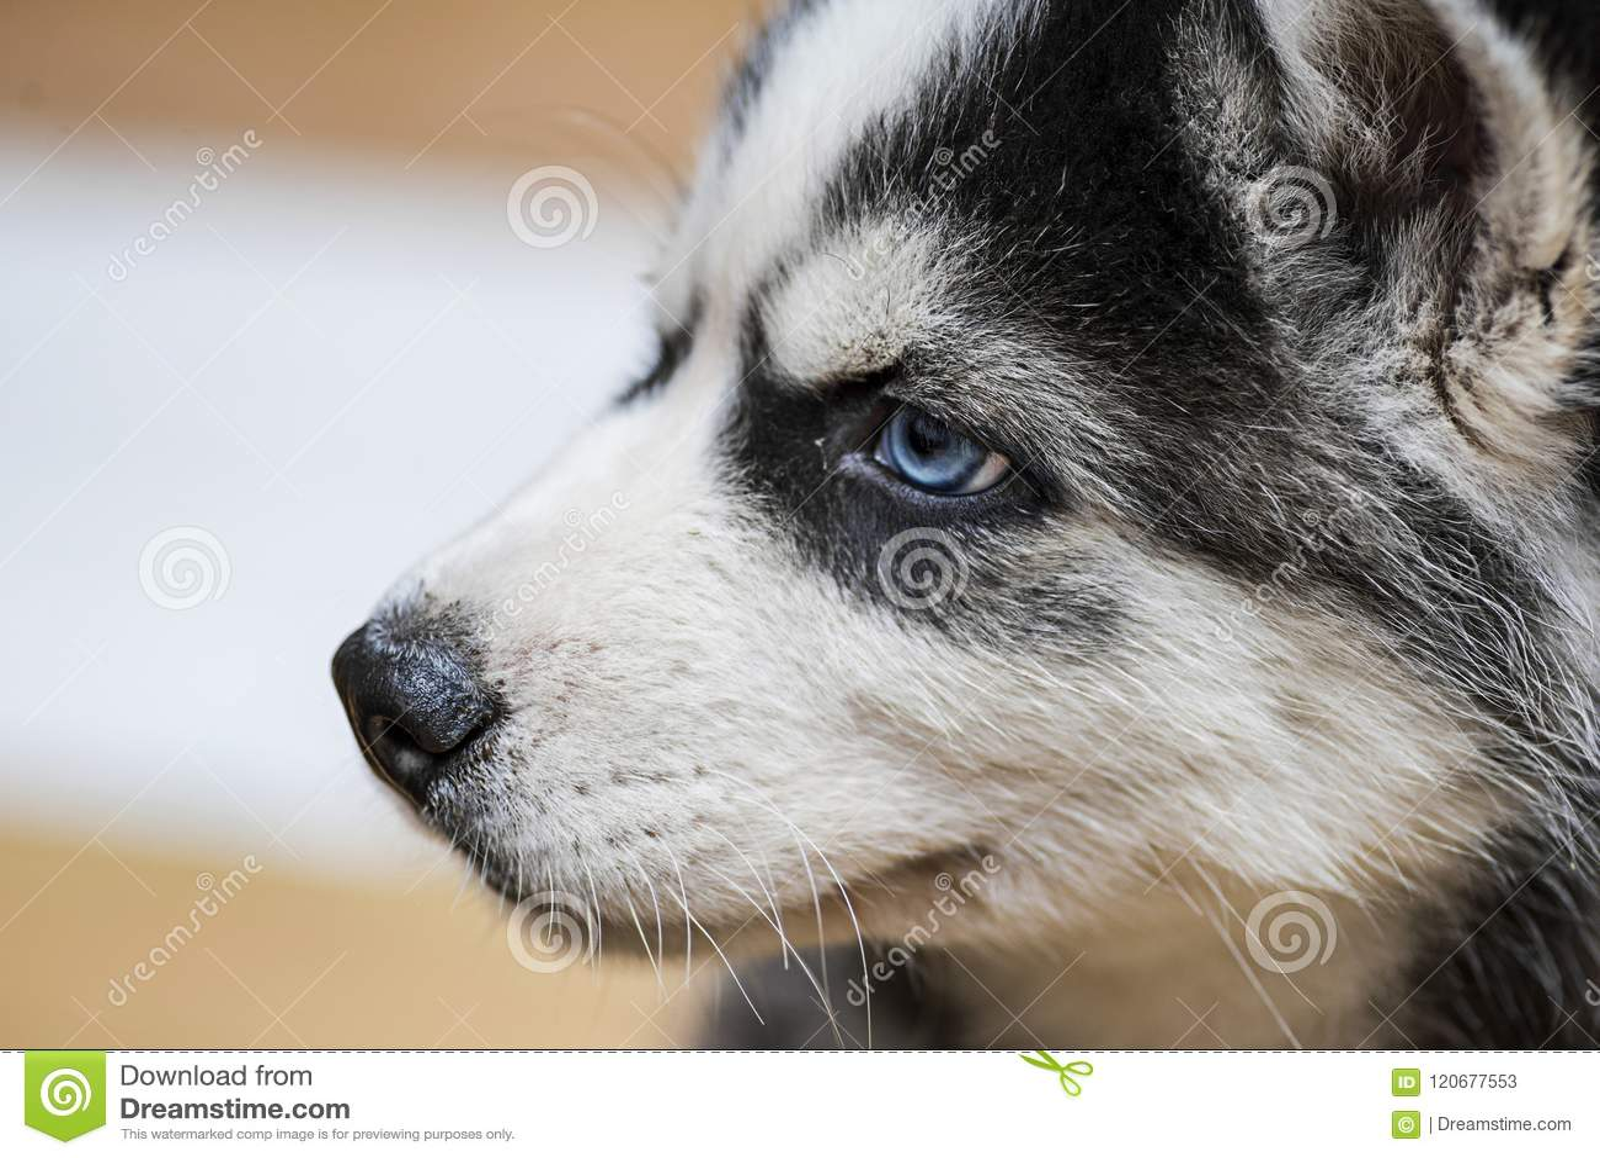 Siberian Husky Puppy With Blue Eyes Stock Image Image Of Nobody